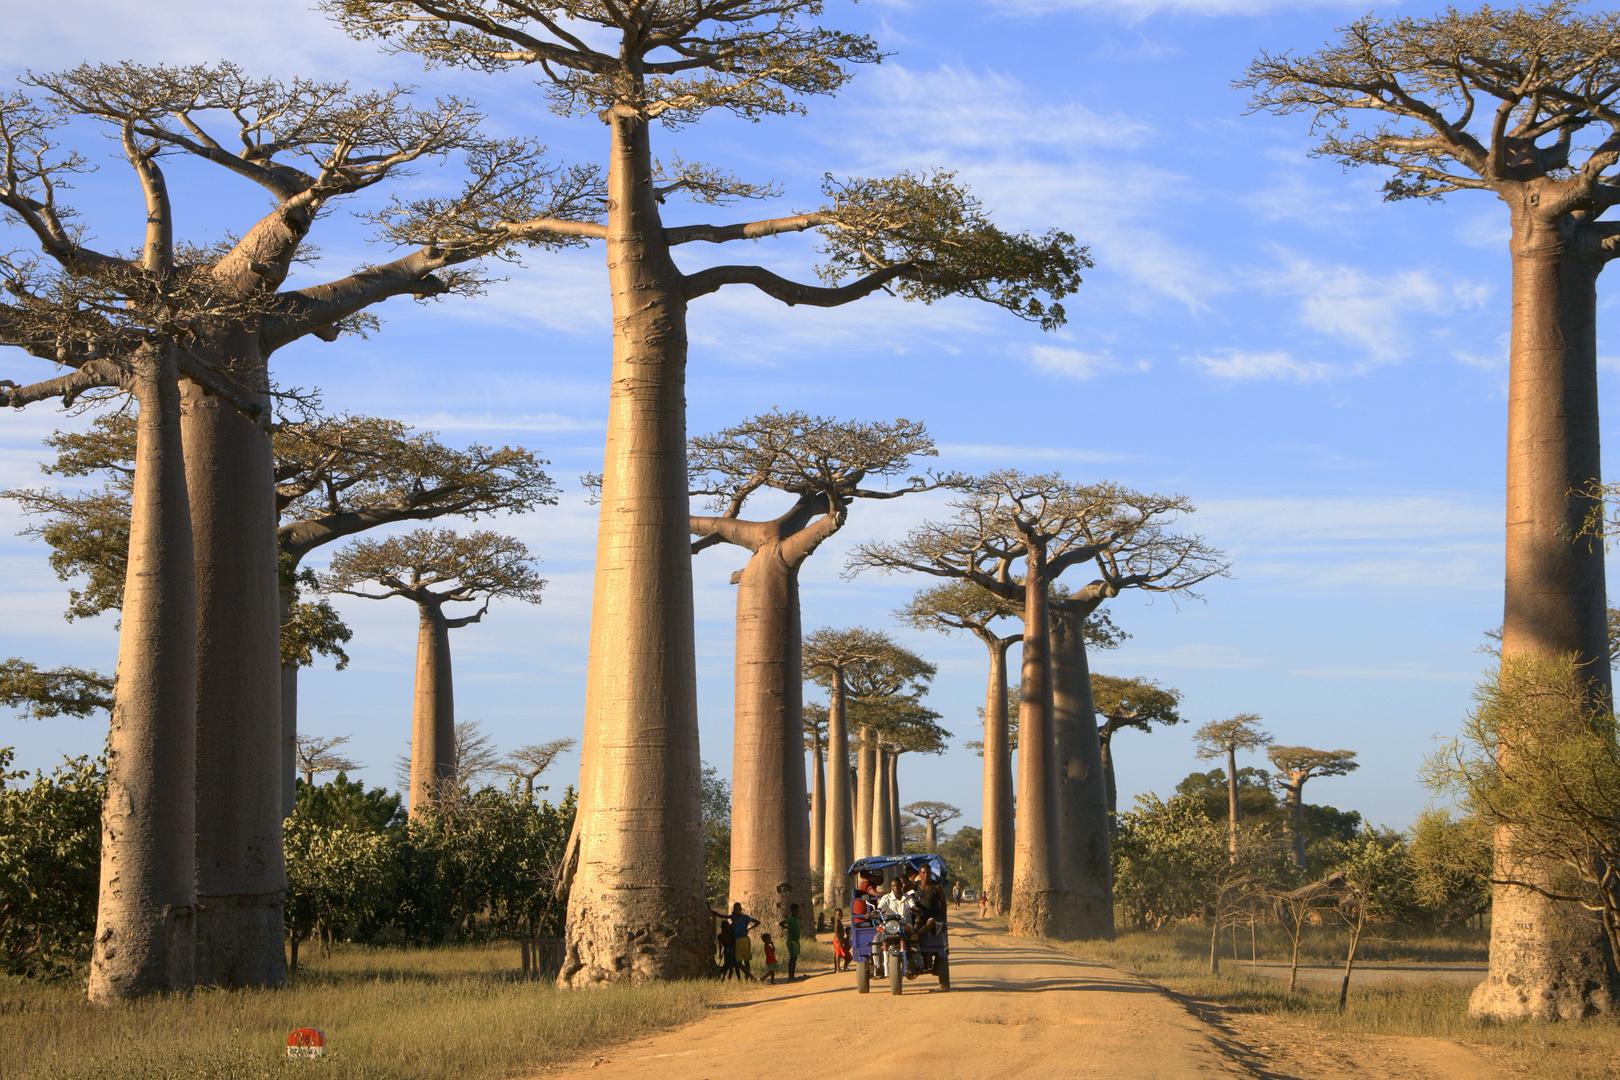 baobab allee bei morondava foto bild world b ume natur bilder auf fotocommunity. Black Bedroom Furniture Sets. Home Design Ideas